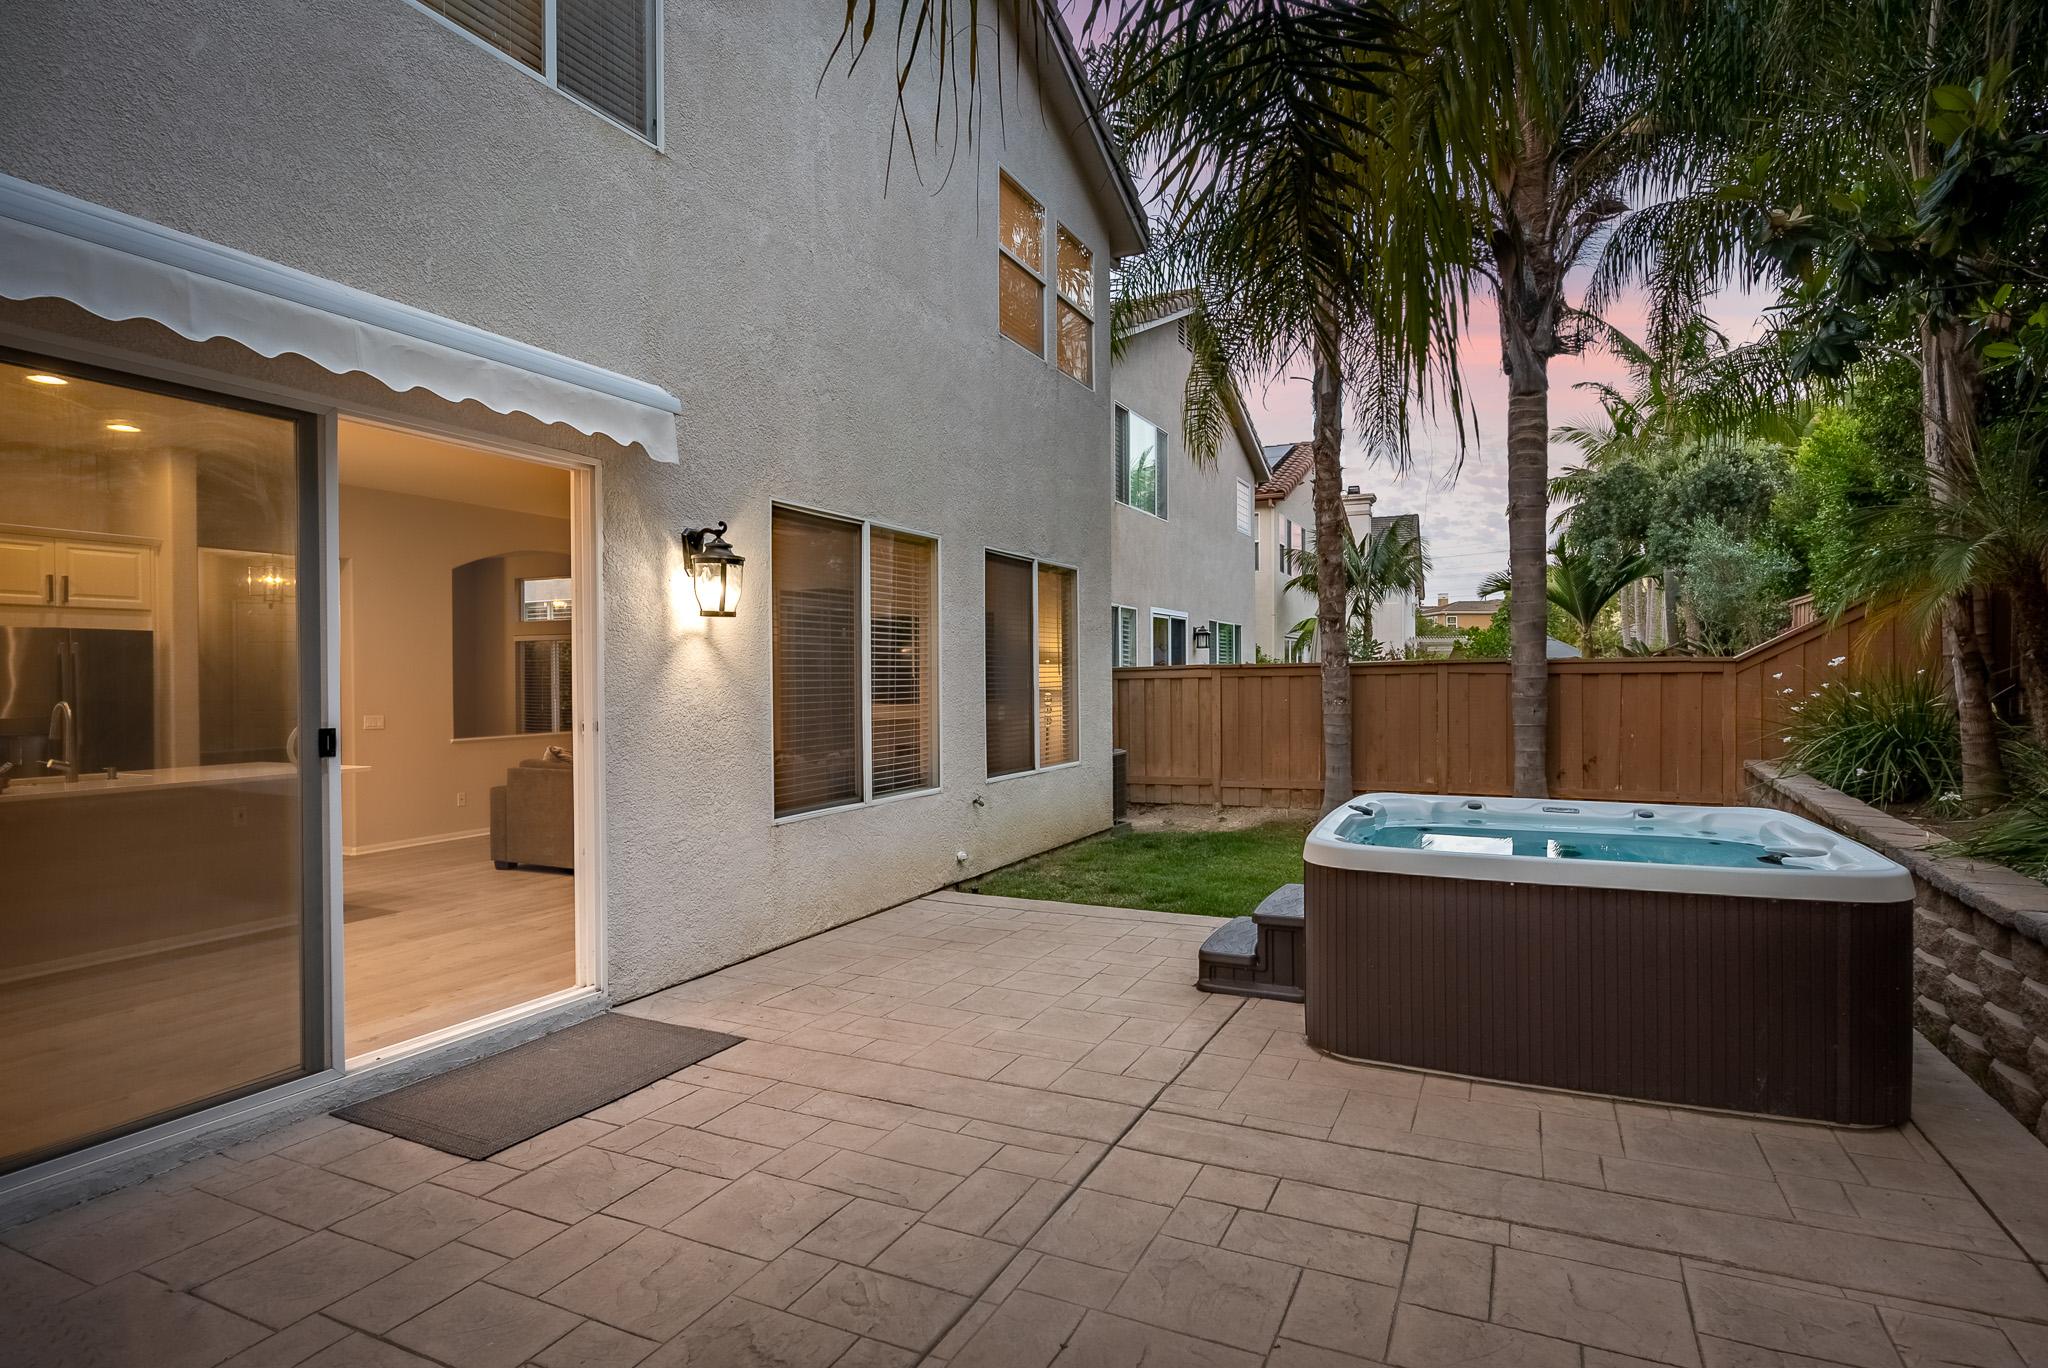 Sold 2021 Laura Represented Seller -  San Diego, CA 92130